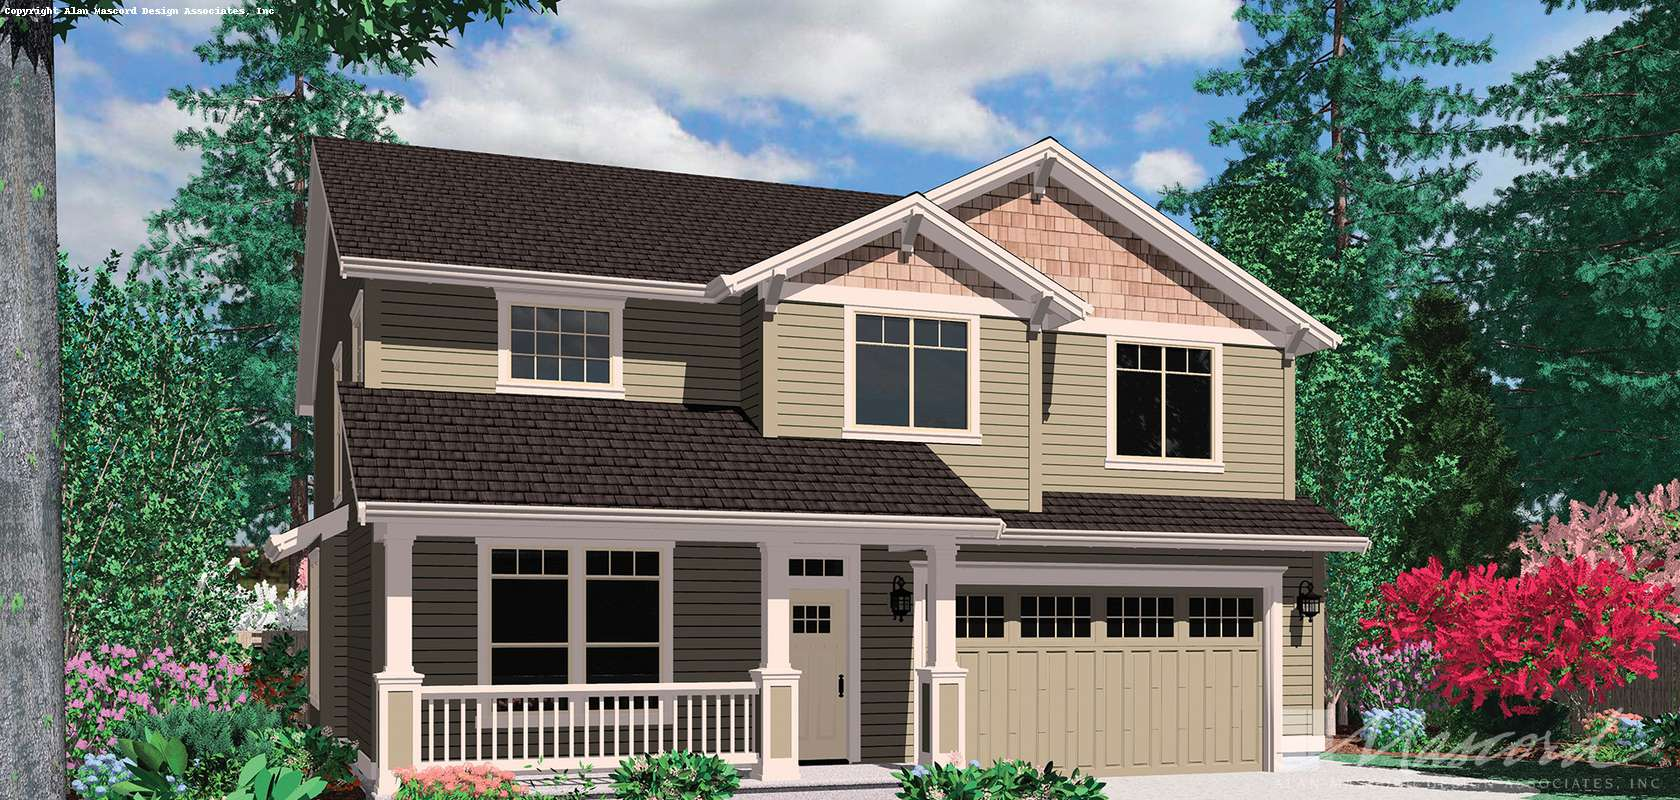 Mascord House Plan 22125: The Afton